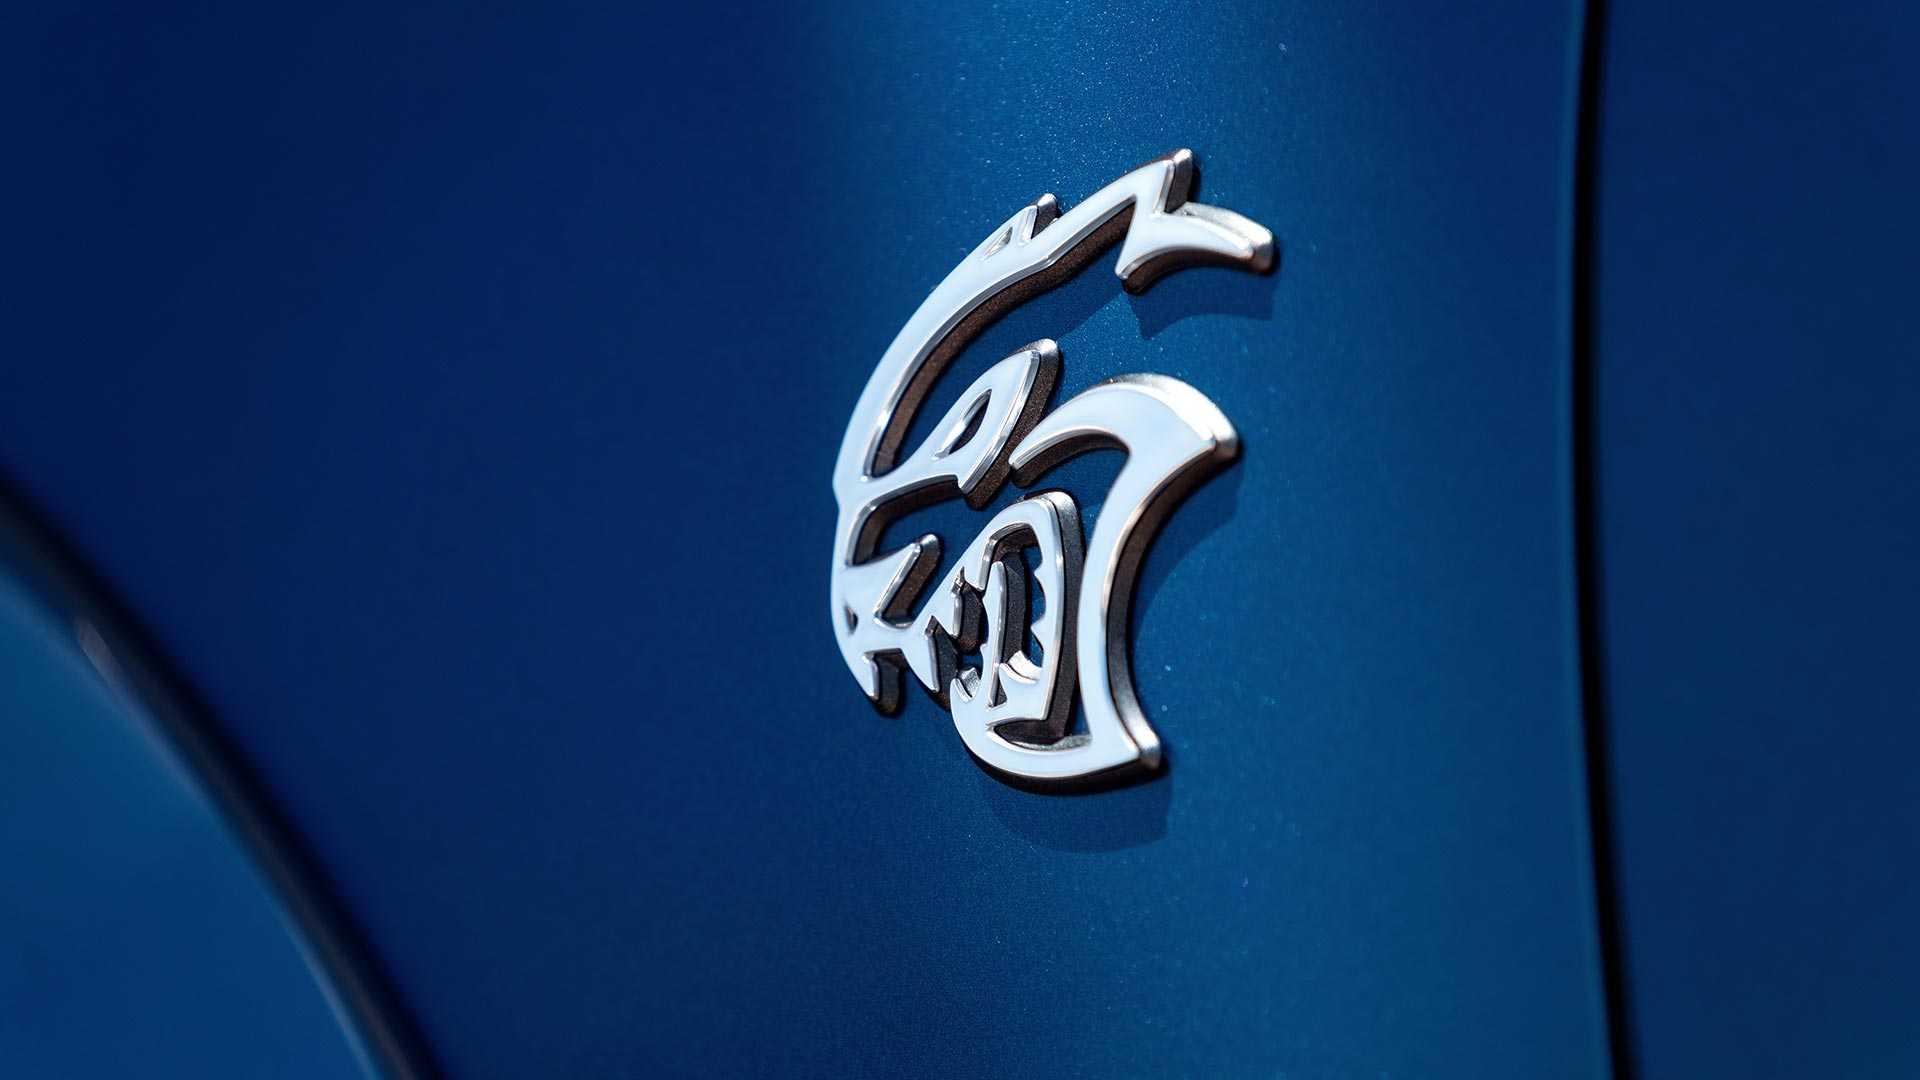 Dodge Ram Logo Wallpaper Posted By Ryan Peltier